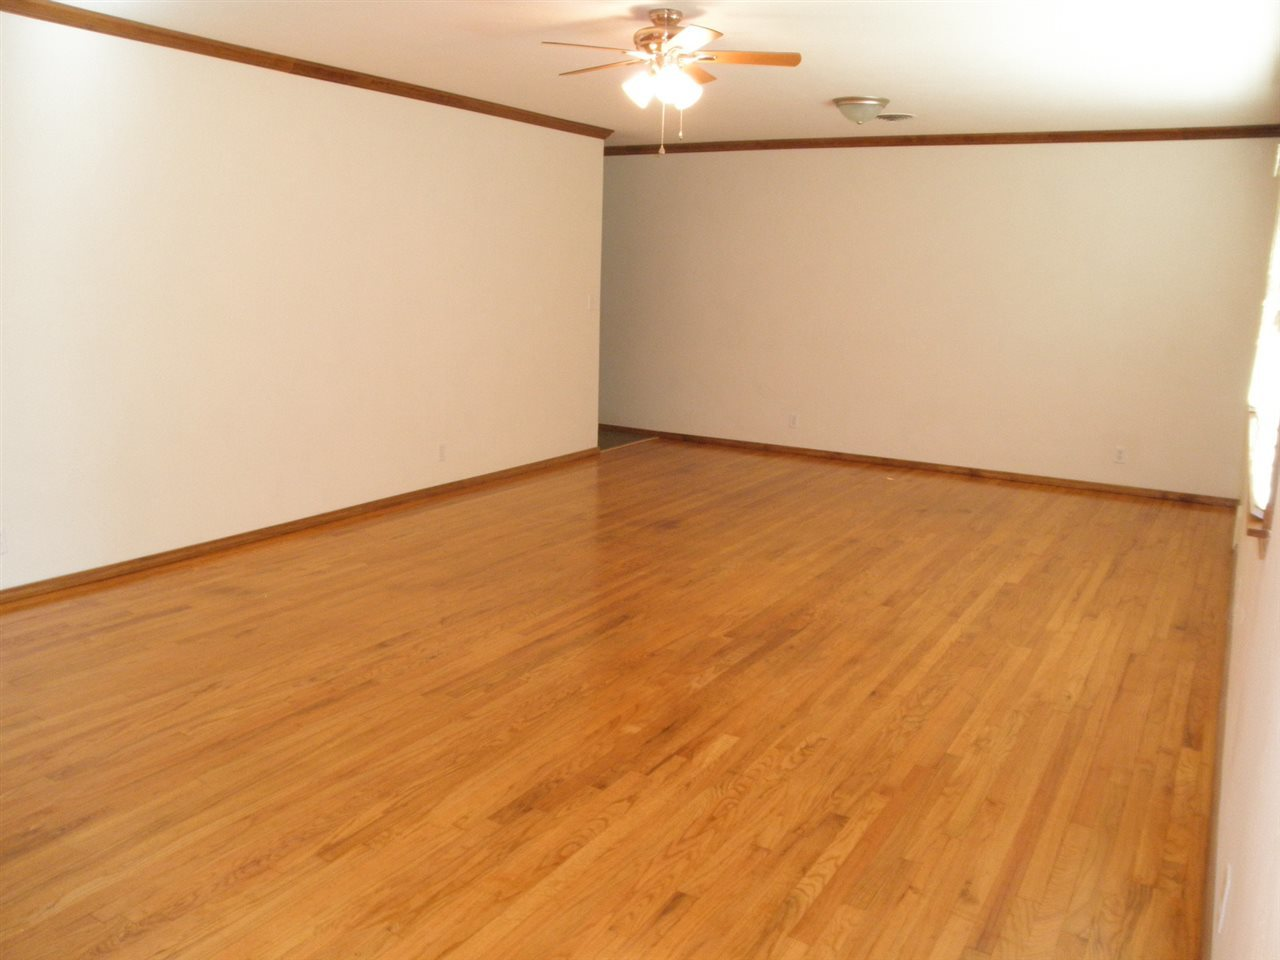 Sold Cross Sale W/ MLS   204 N 13th  Ponca City, OK 74601 1